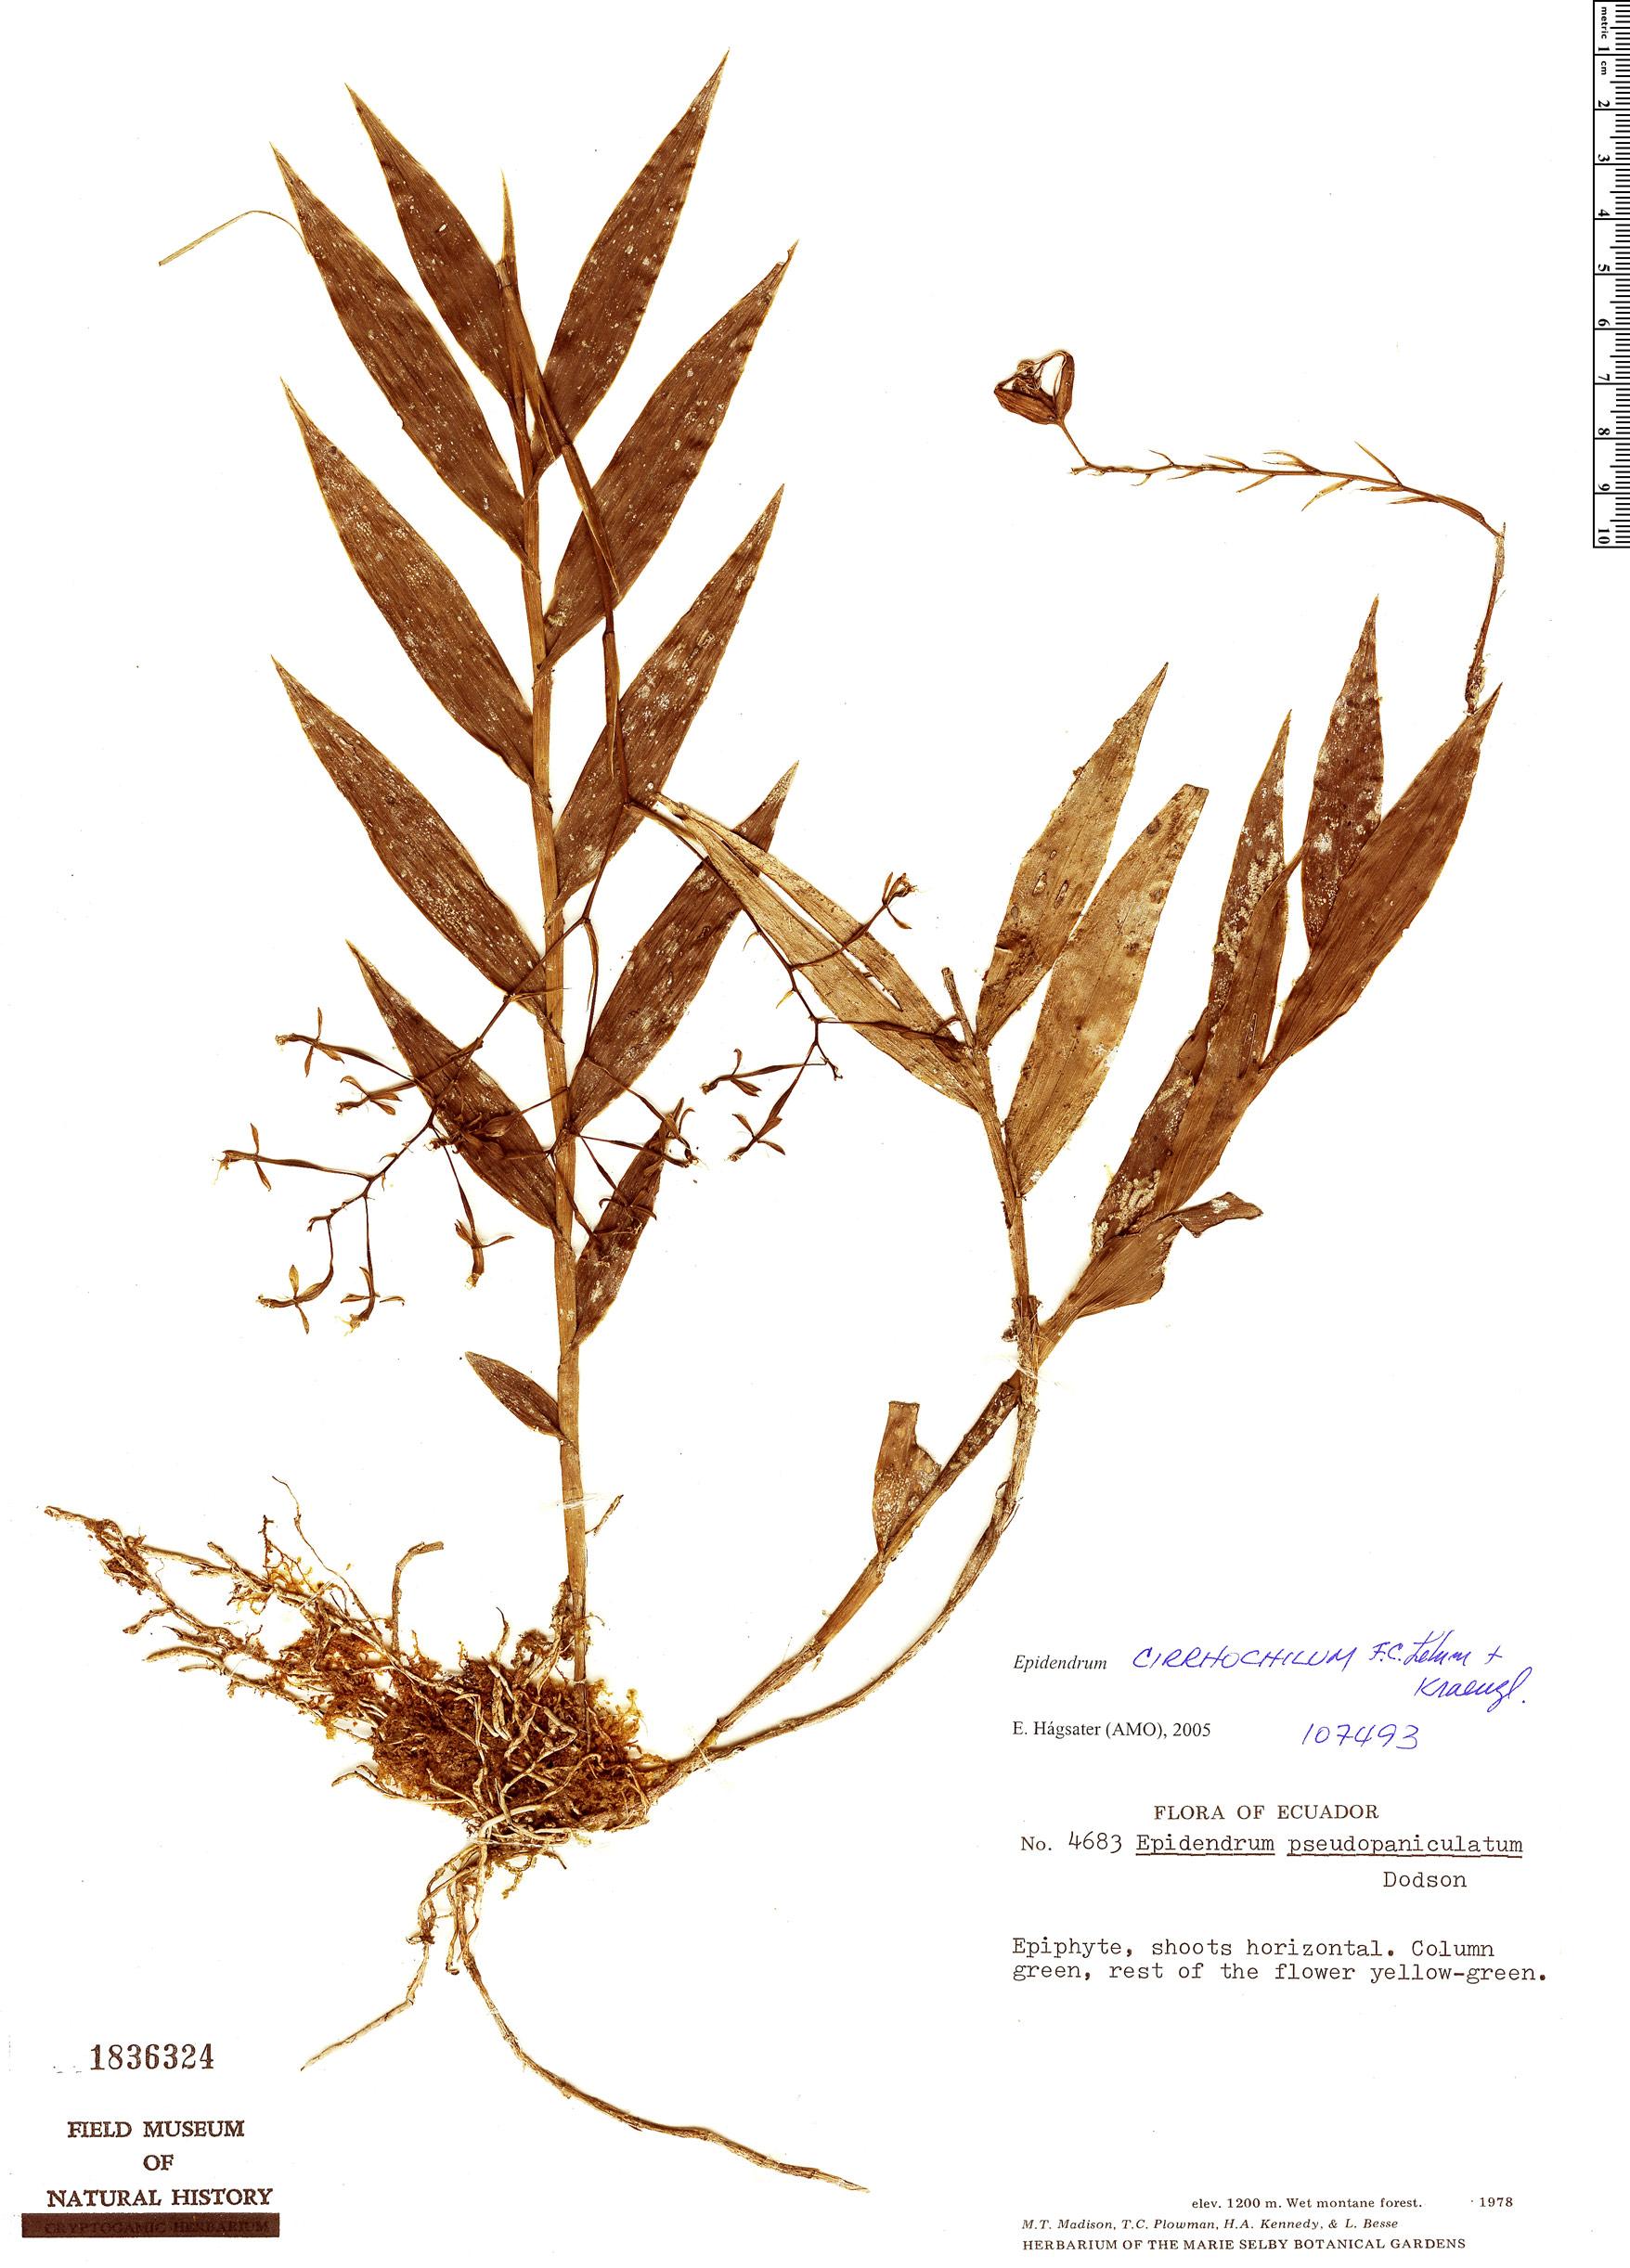 Specimen: Epidendrum cirrhochilum